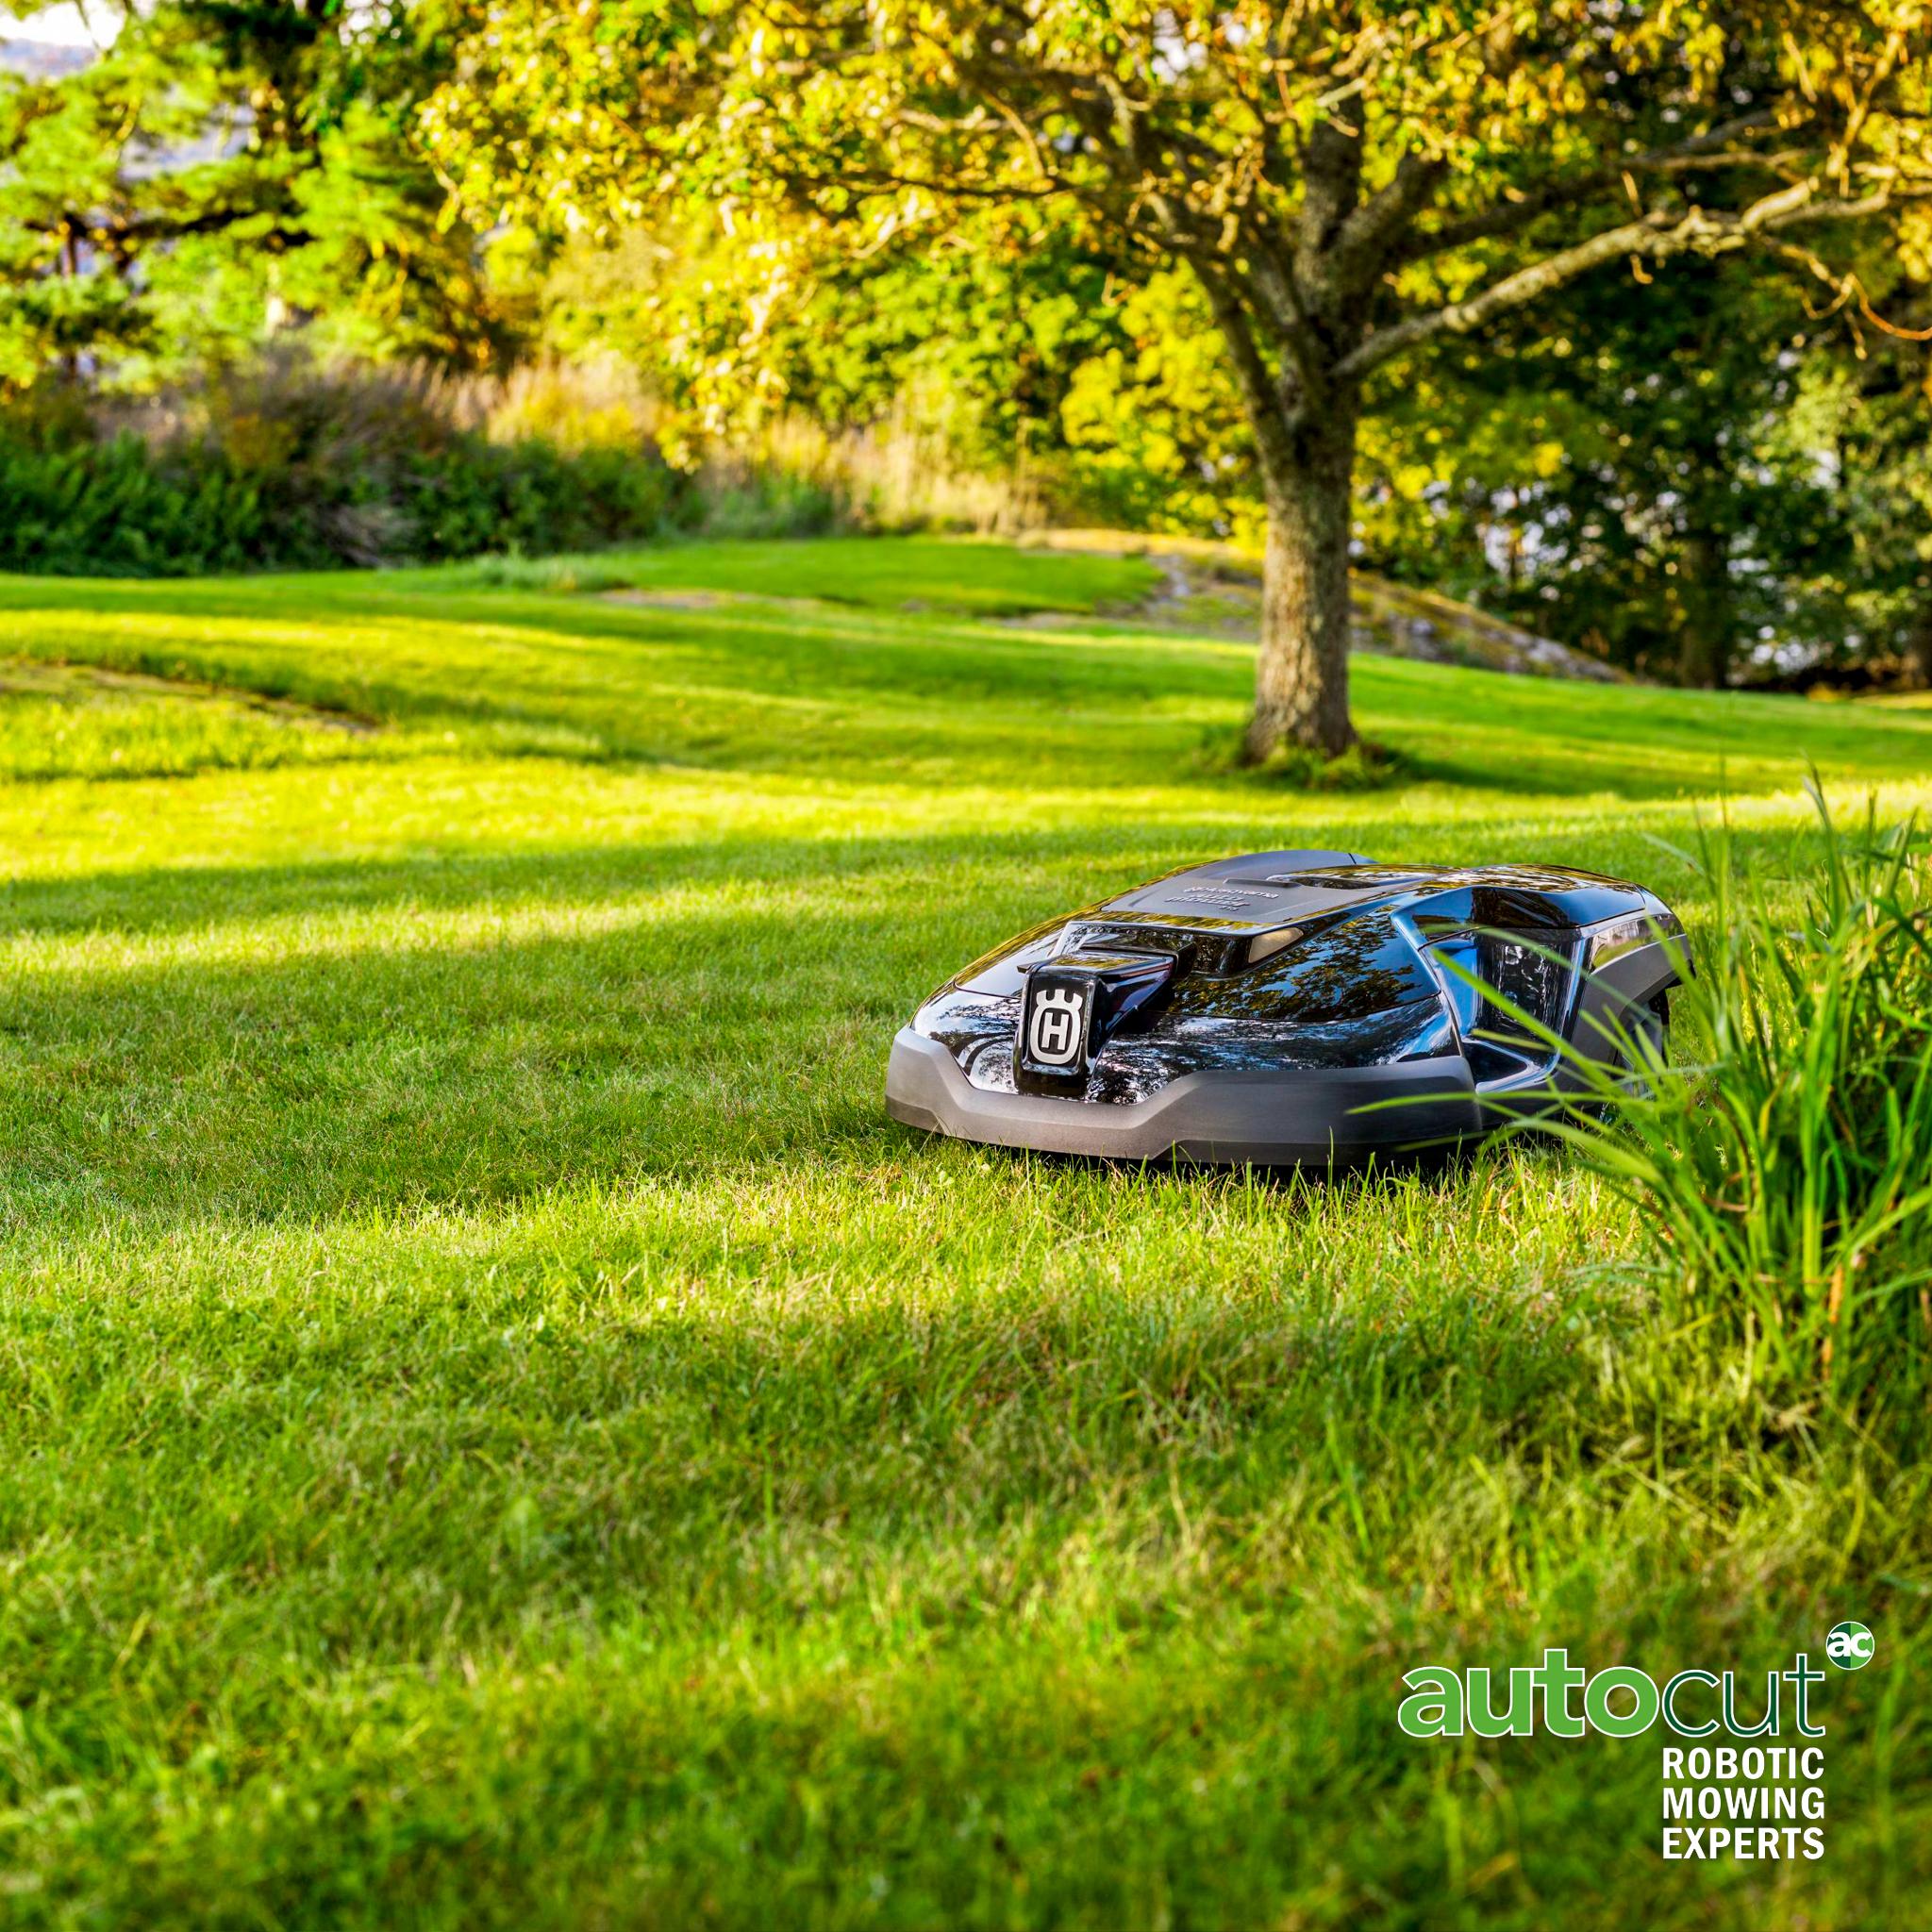 Meet the Mower: Automower® 315